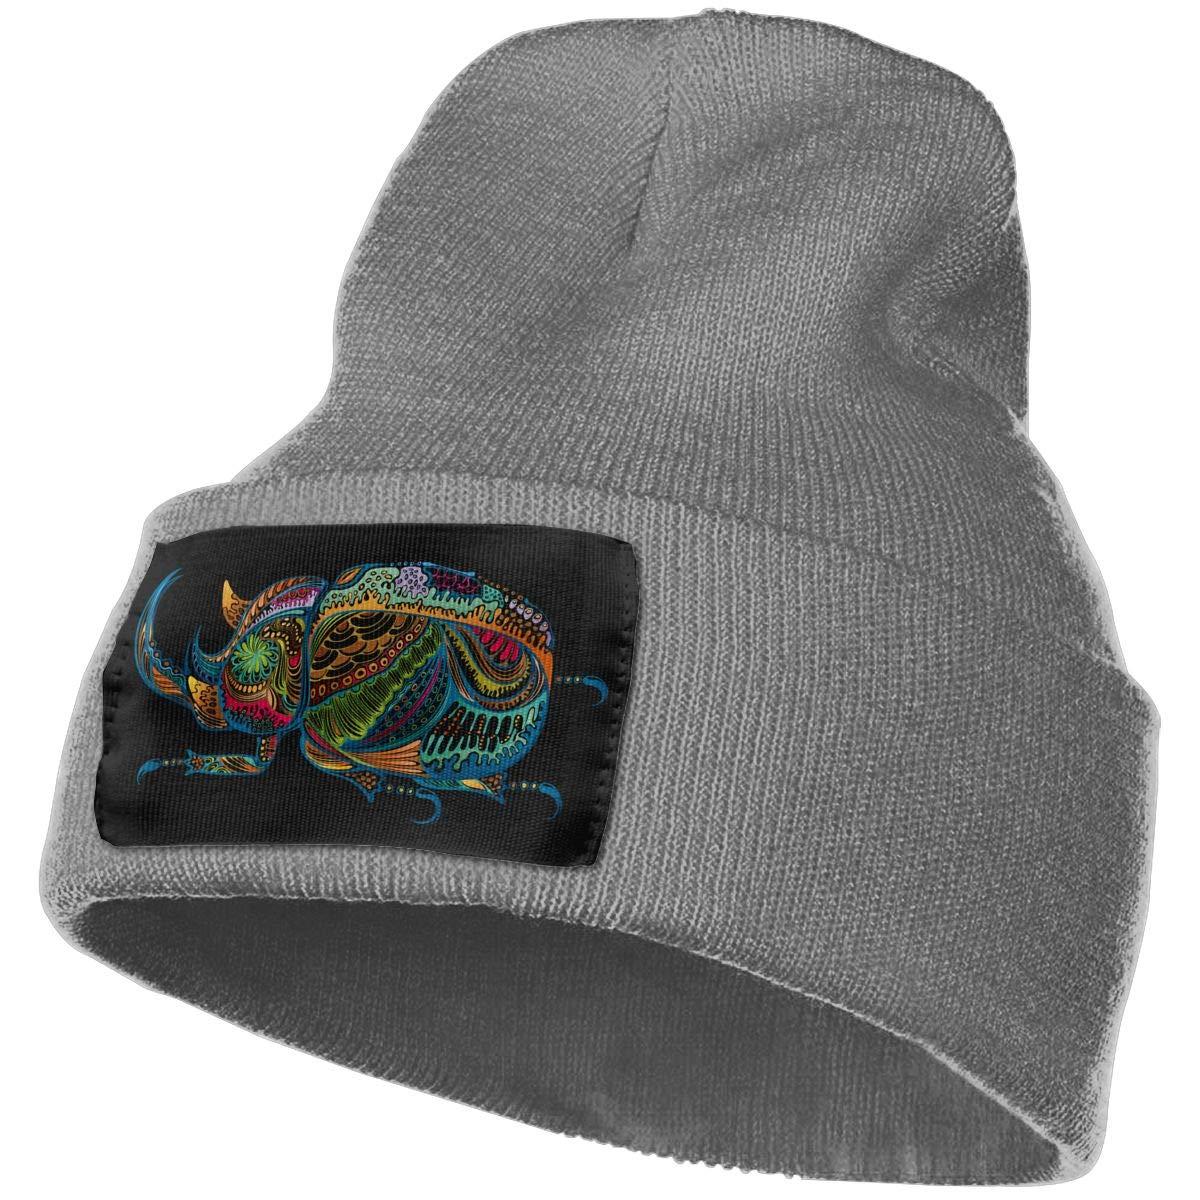 Creative Artistic Colorful The Beetle Warm Winter Hat Knit Beanie Skull Cap Cuff Beanie Hat Winter Hats for Men /& Women